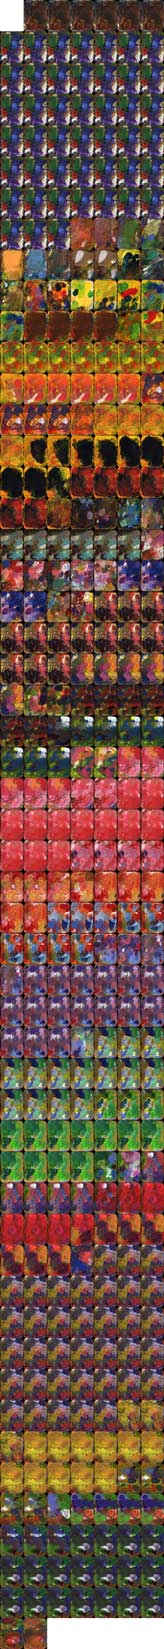 palettes_2007_grid.jpg